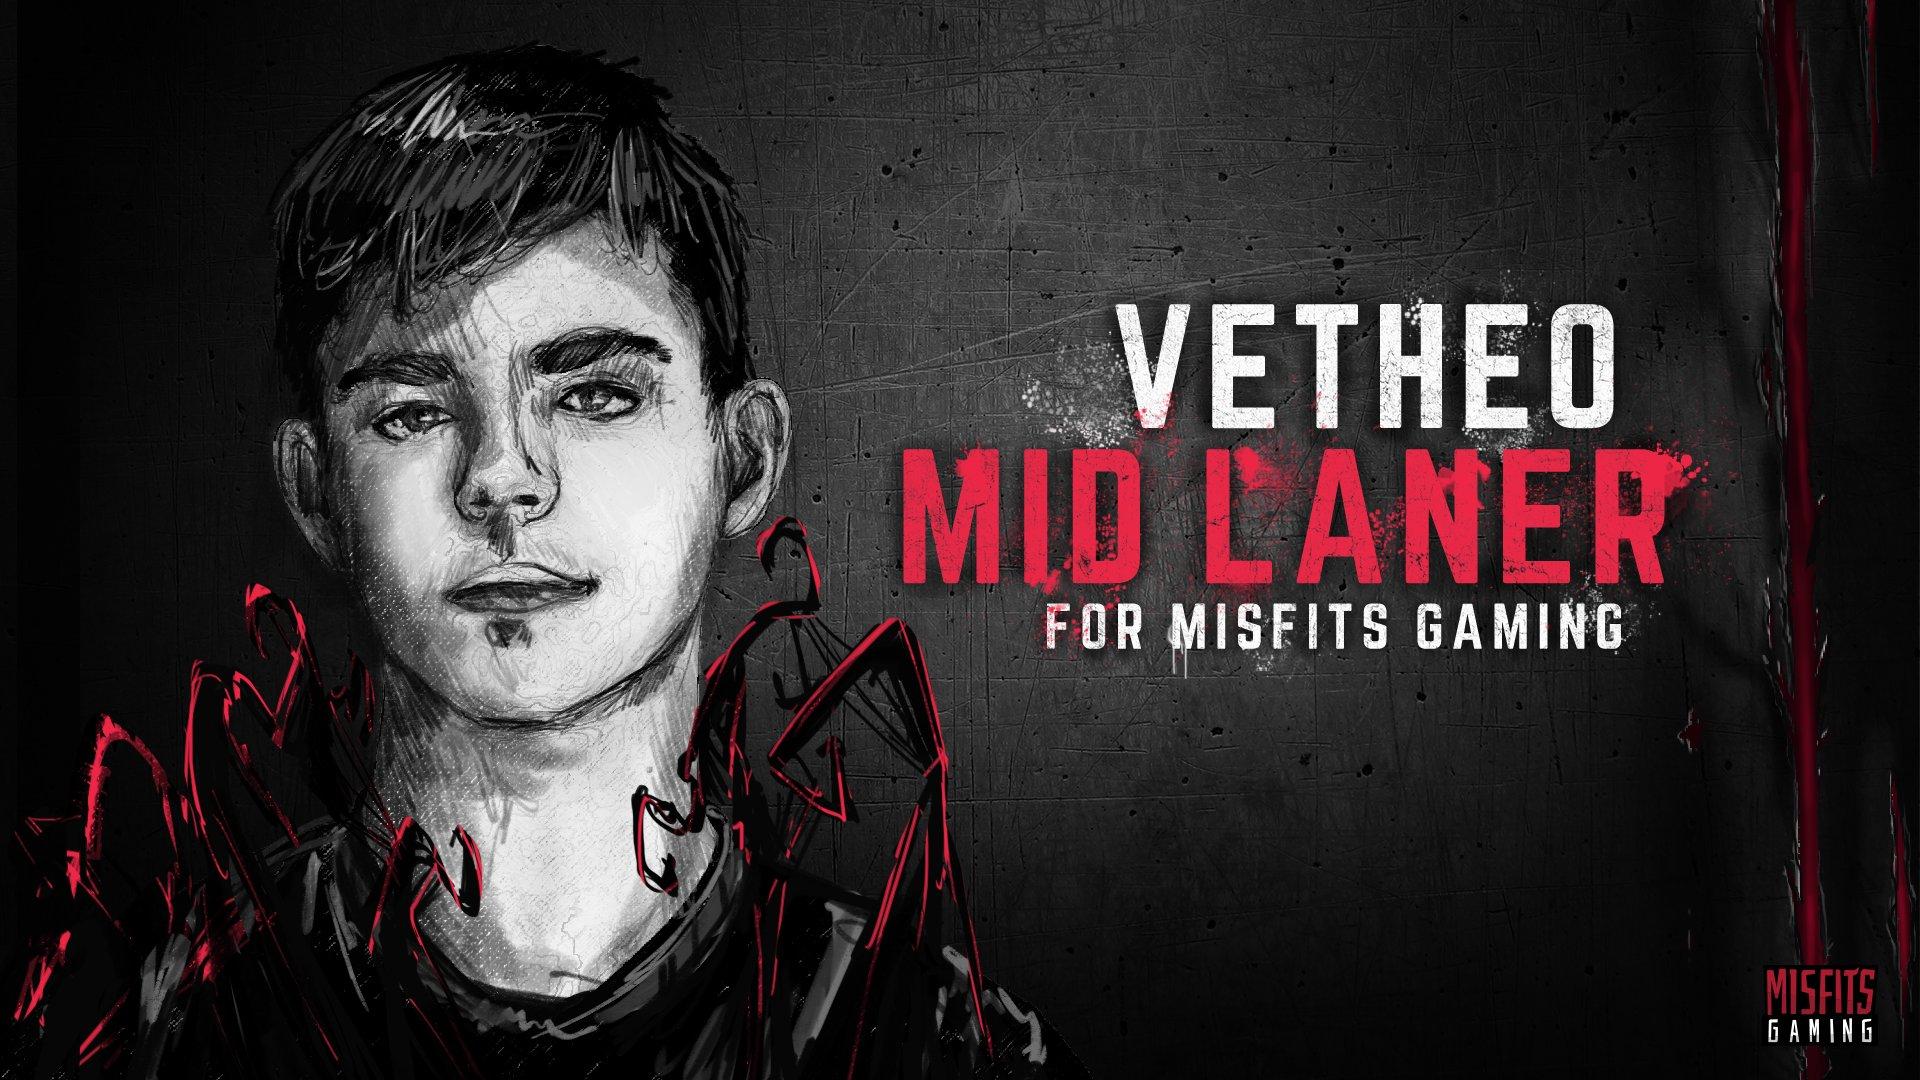 vetheo misfits gaming